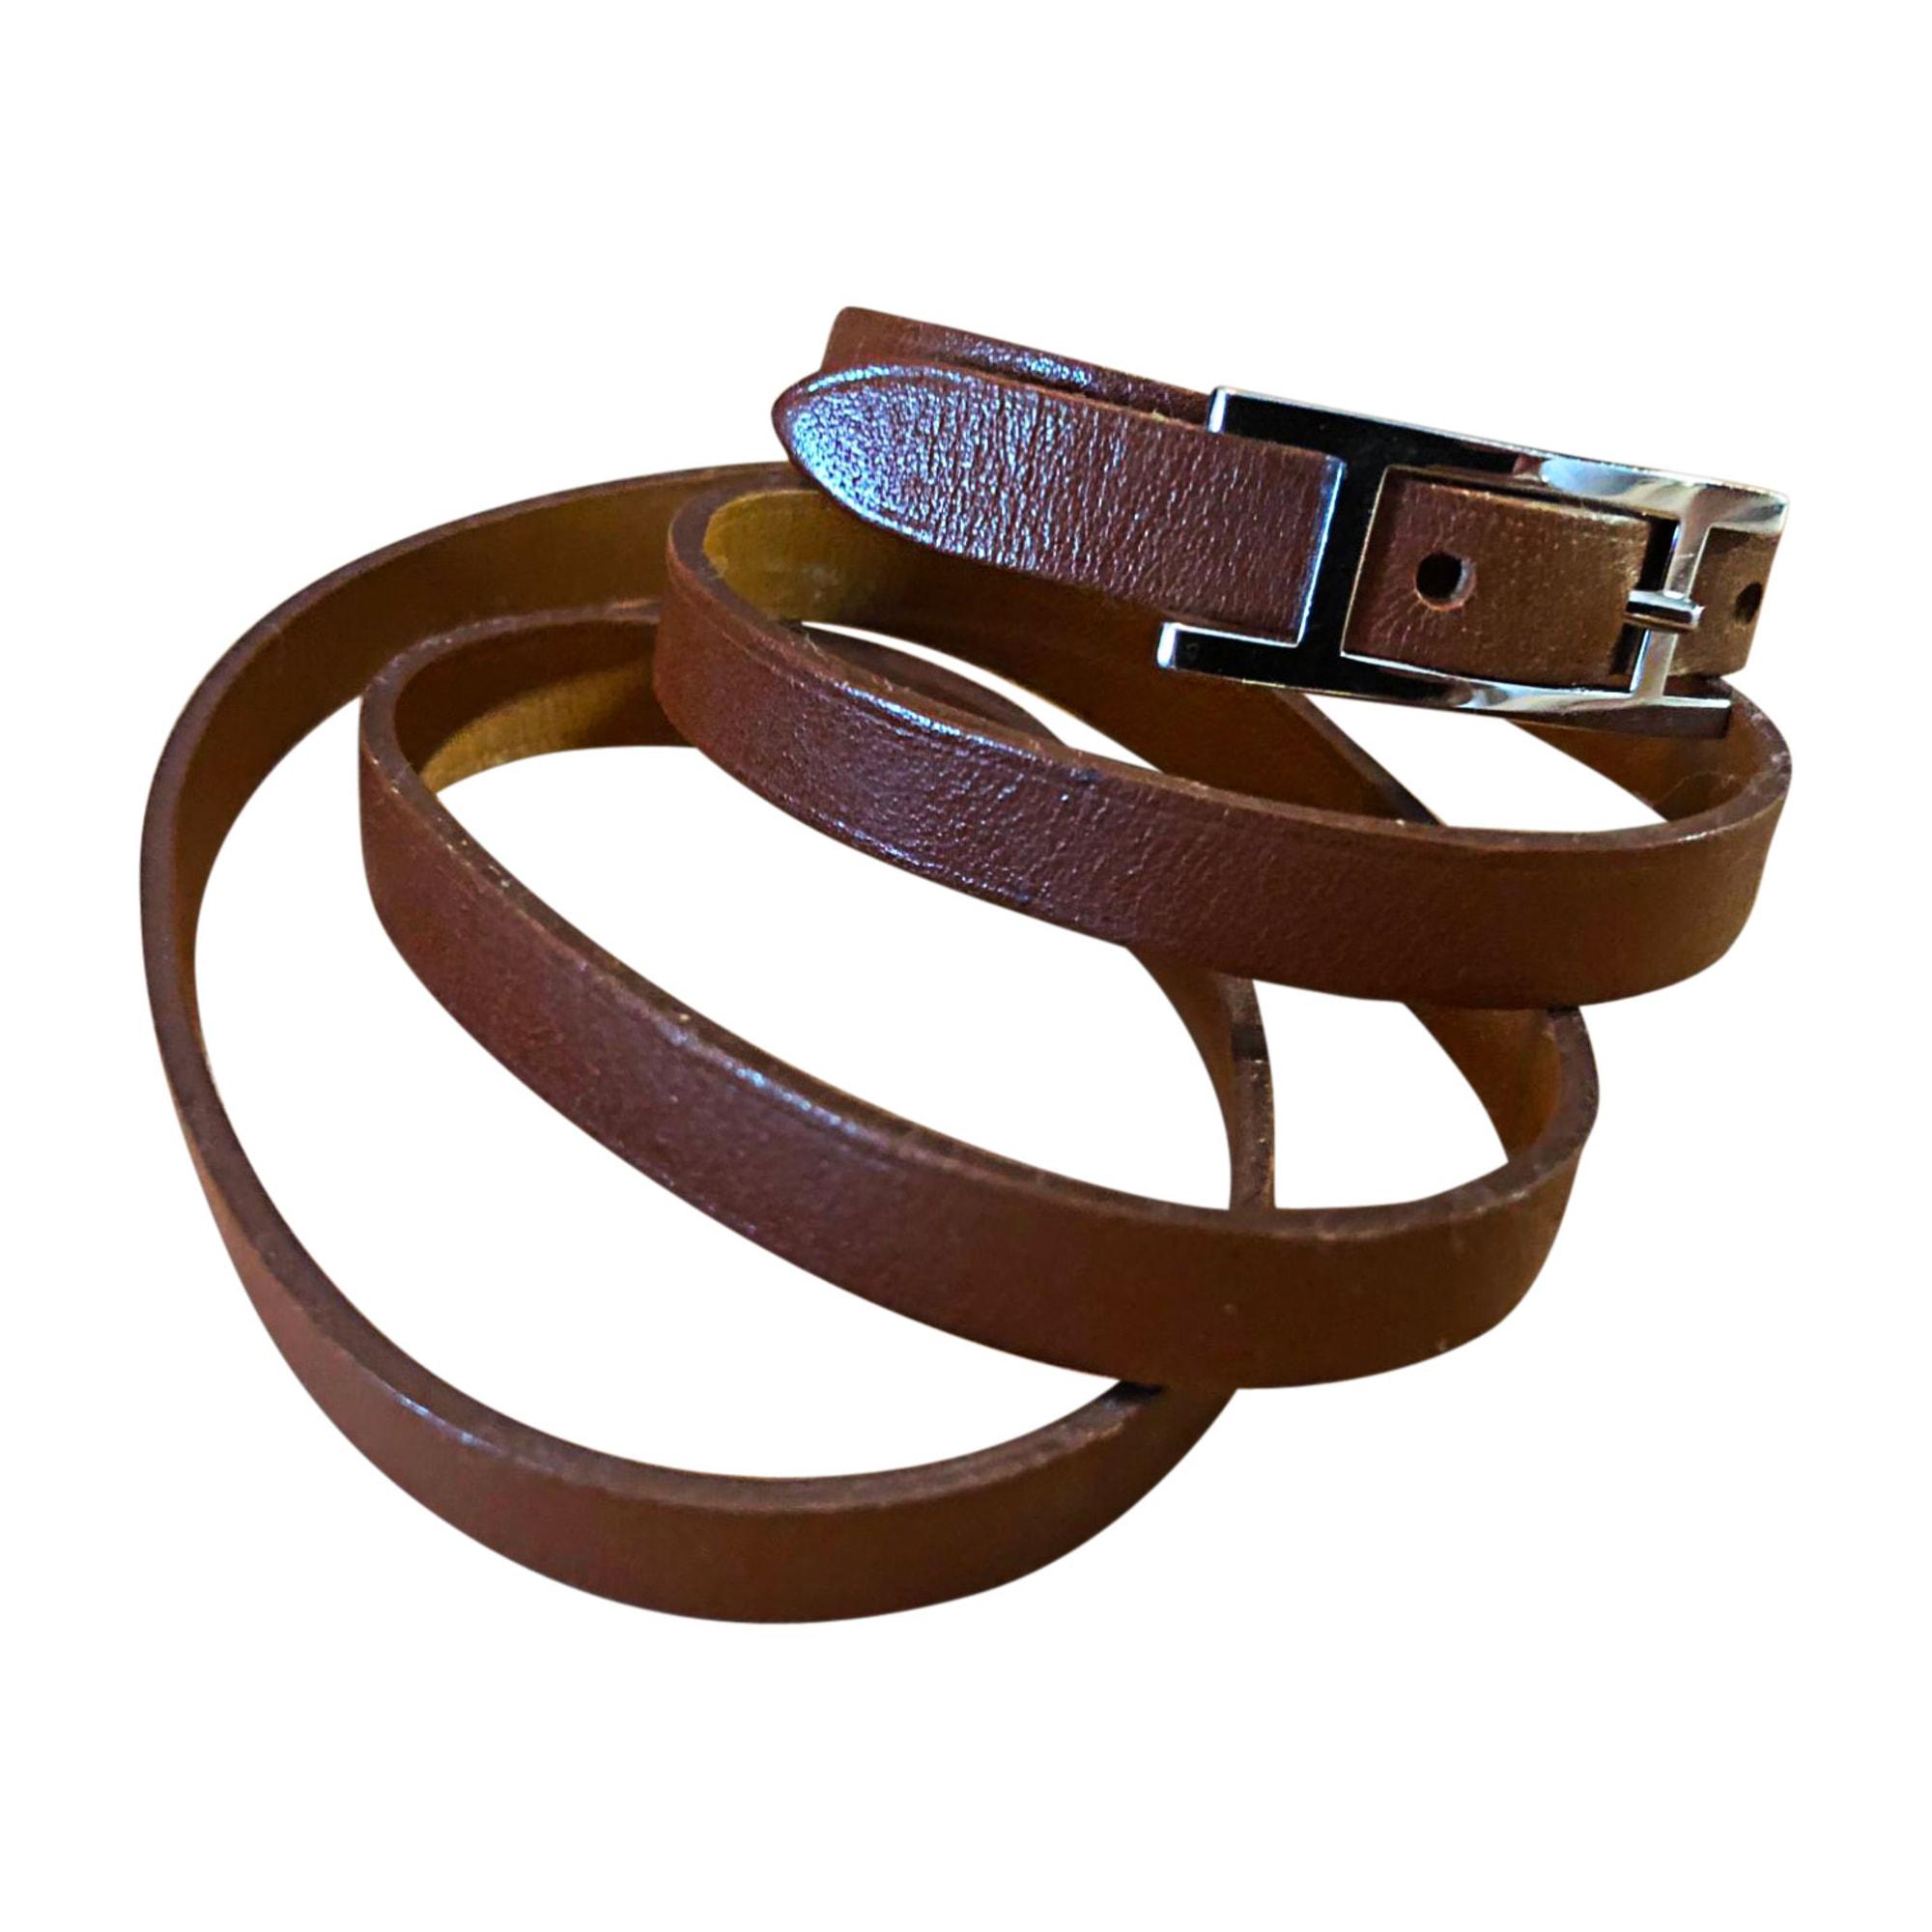 Bracelet HERMÈS hapi marron vendu par Ashleyblc - 8281838 c5821e7a09a